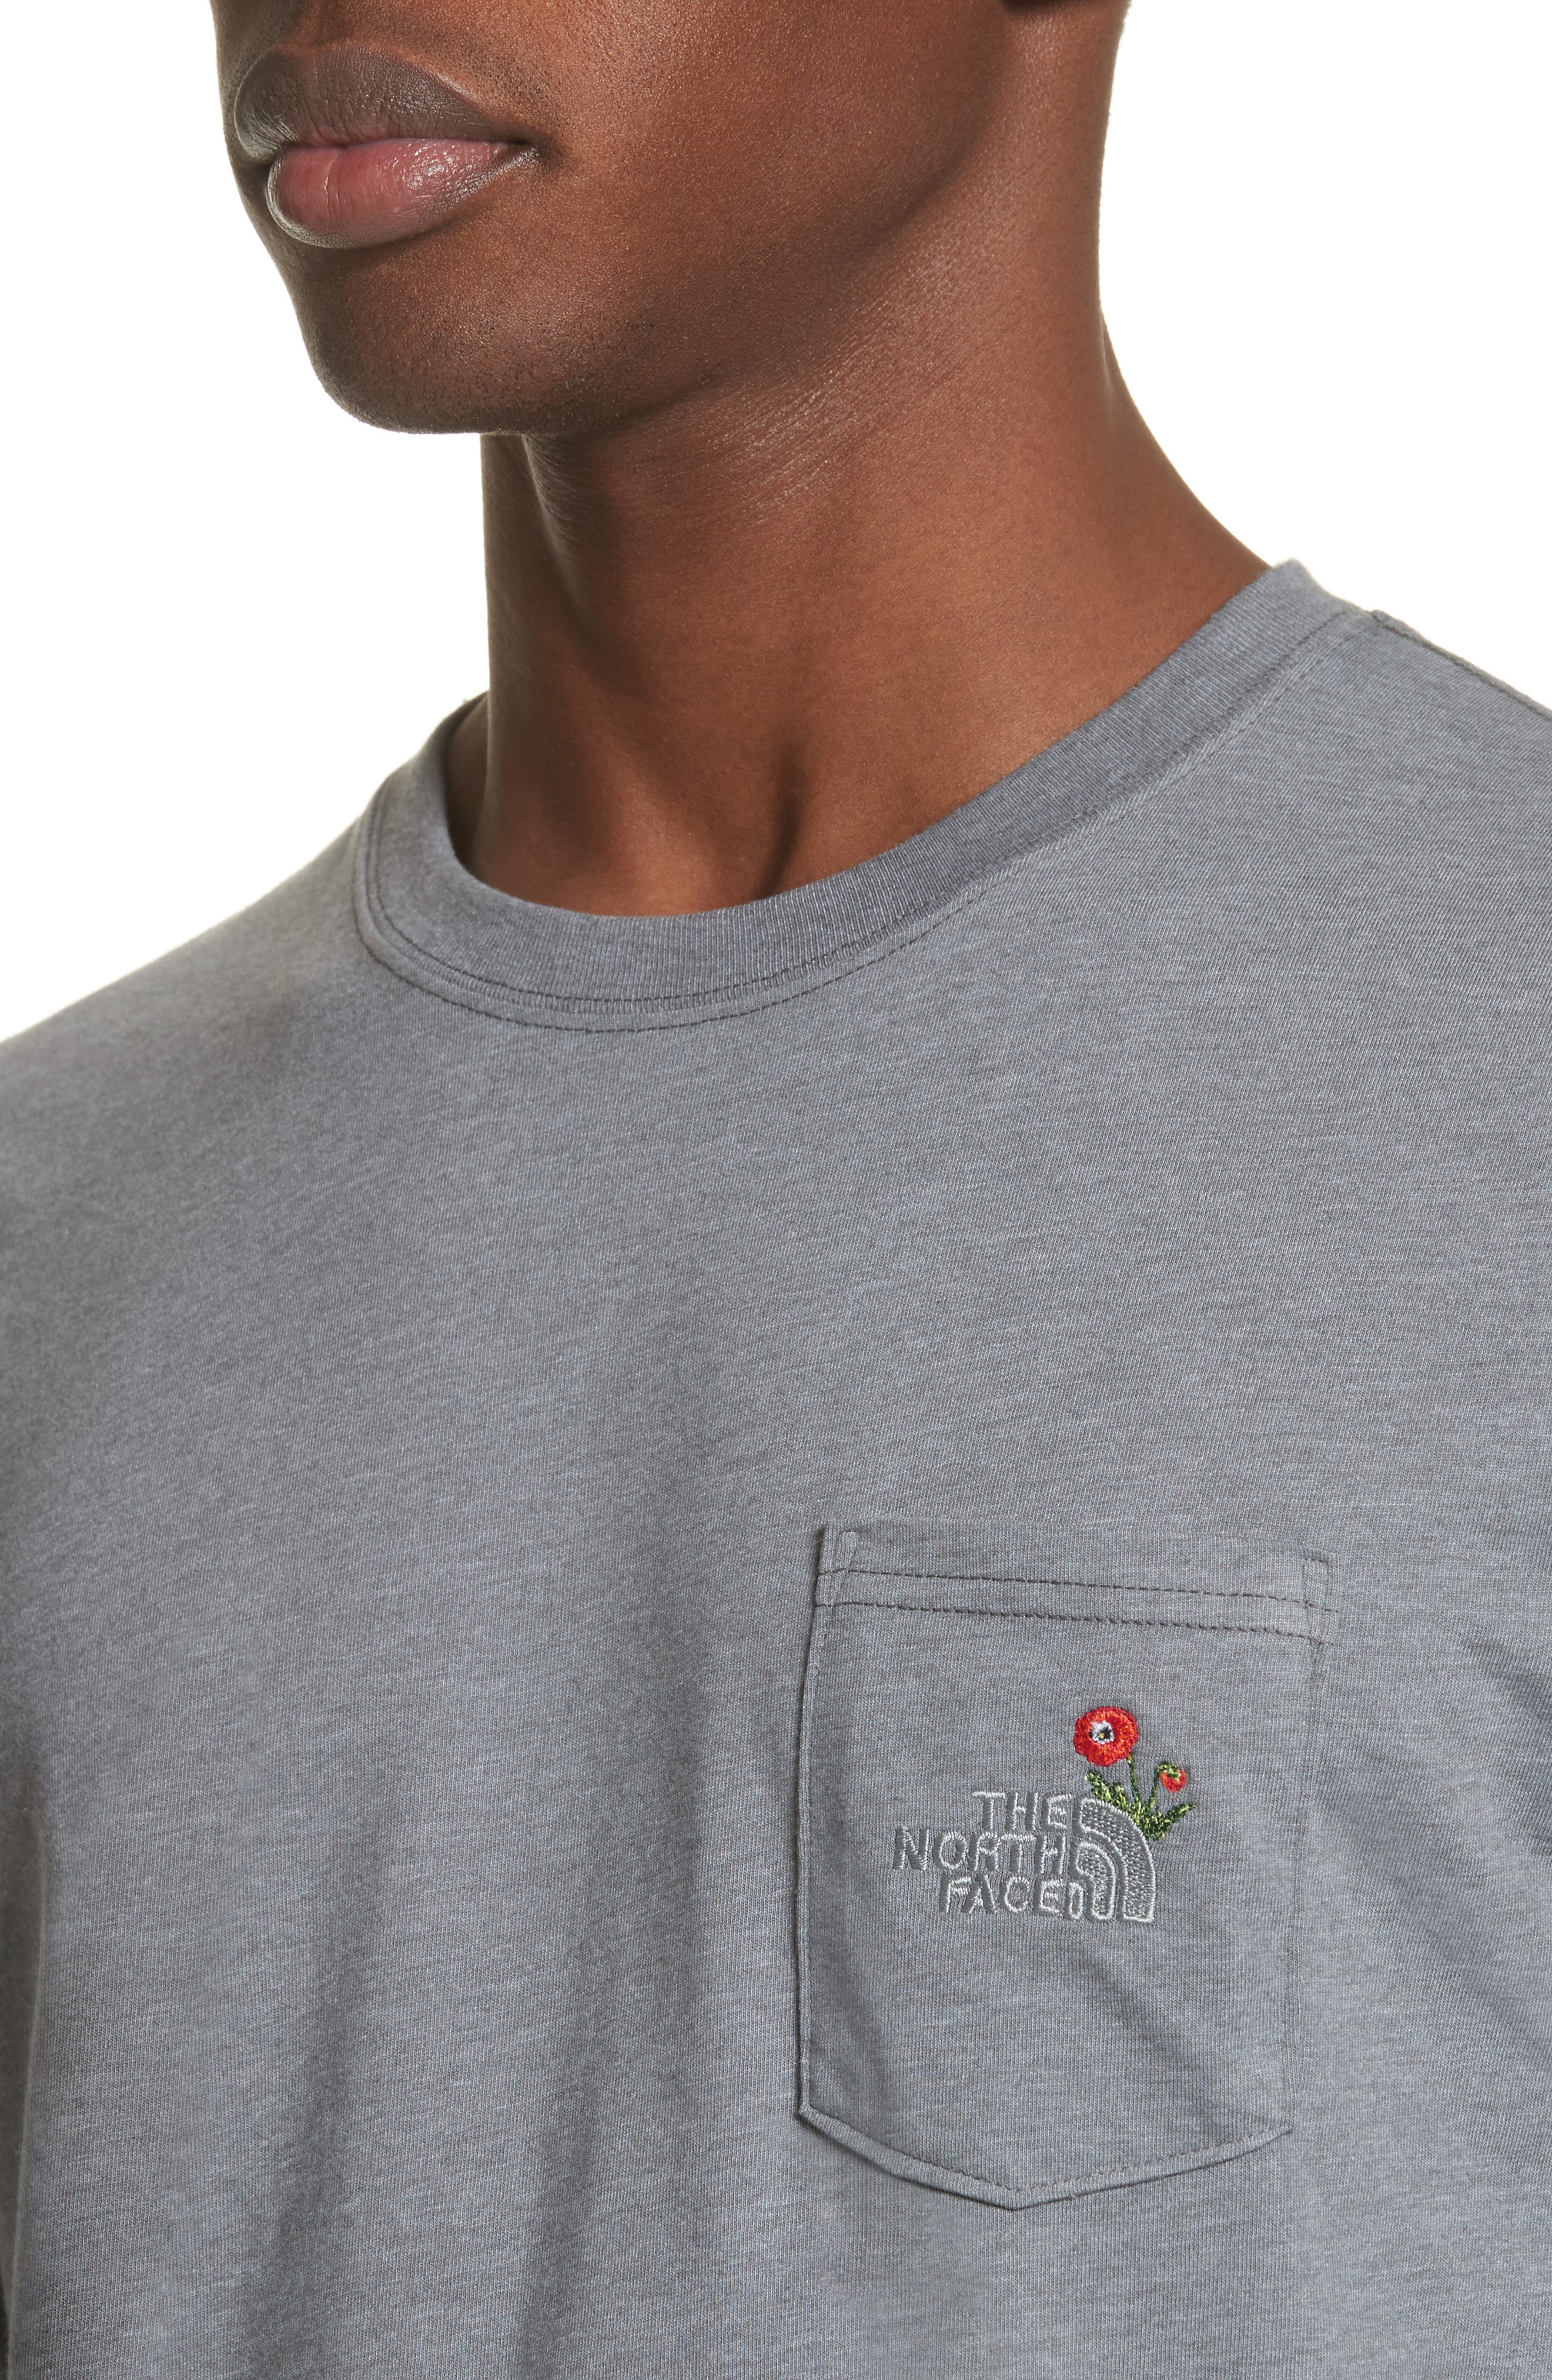 Unisex Pocket T-Shirt,                             Alternate thumbnail 4, color,                             030